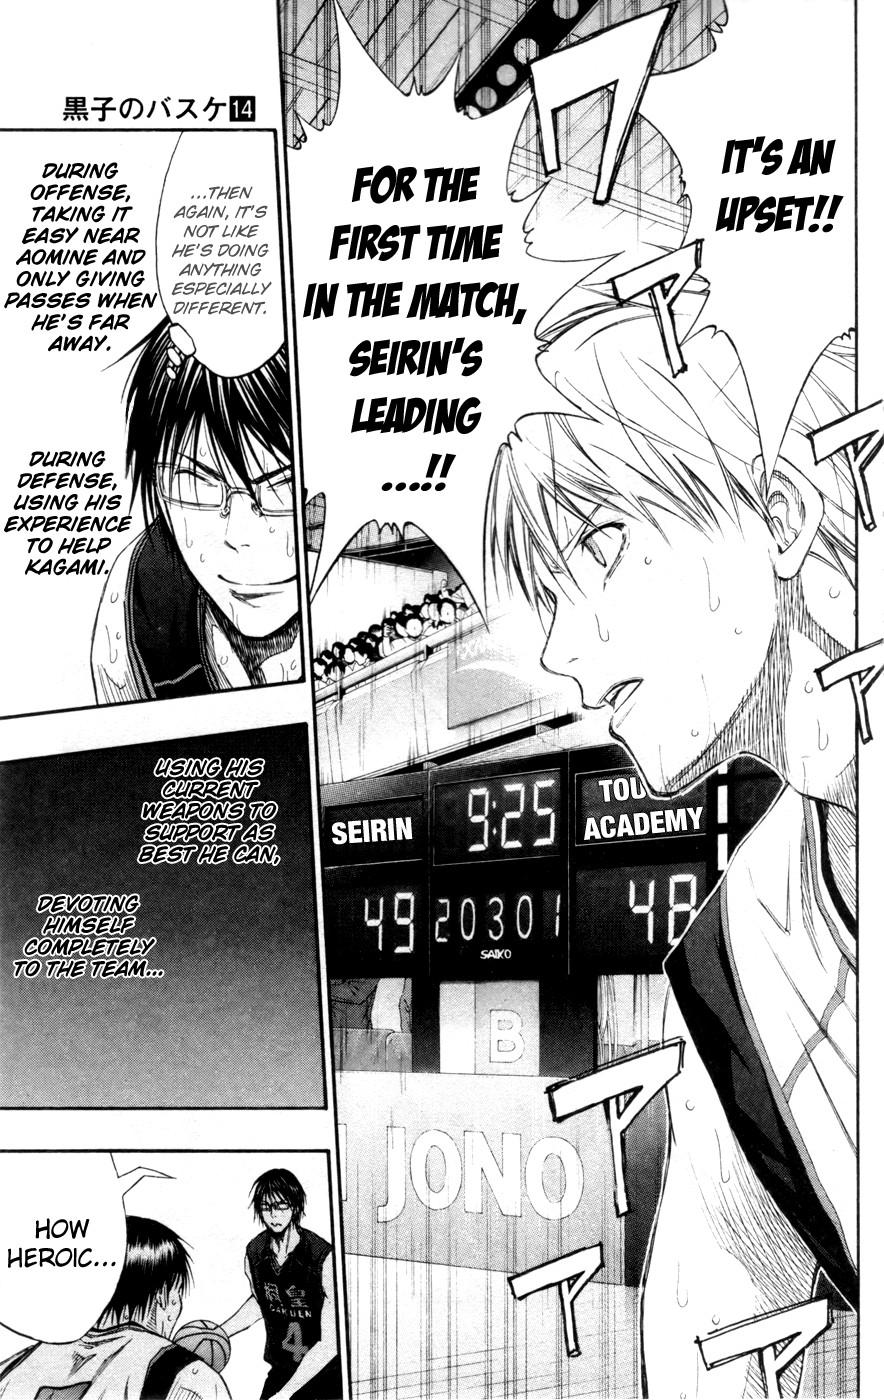 Kuroko no Basket Manga Chapter 125 - Image 17